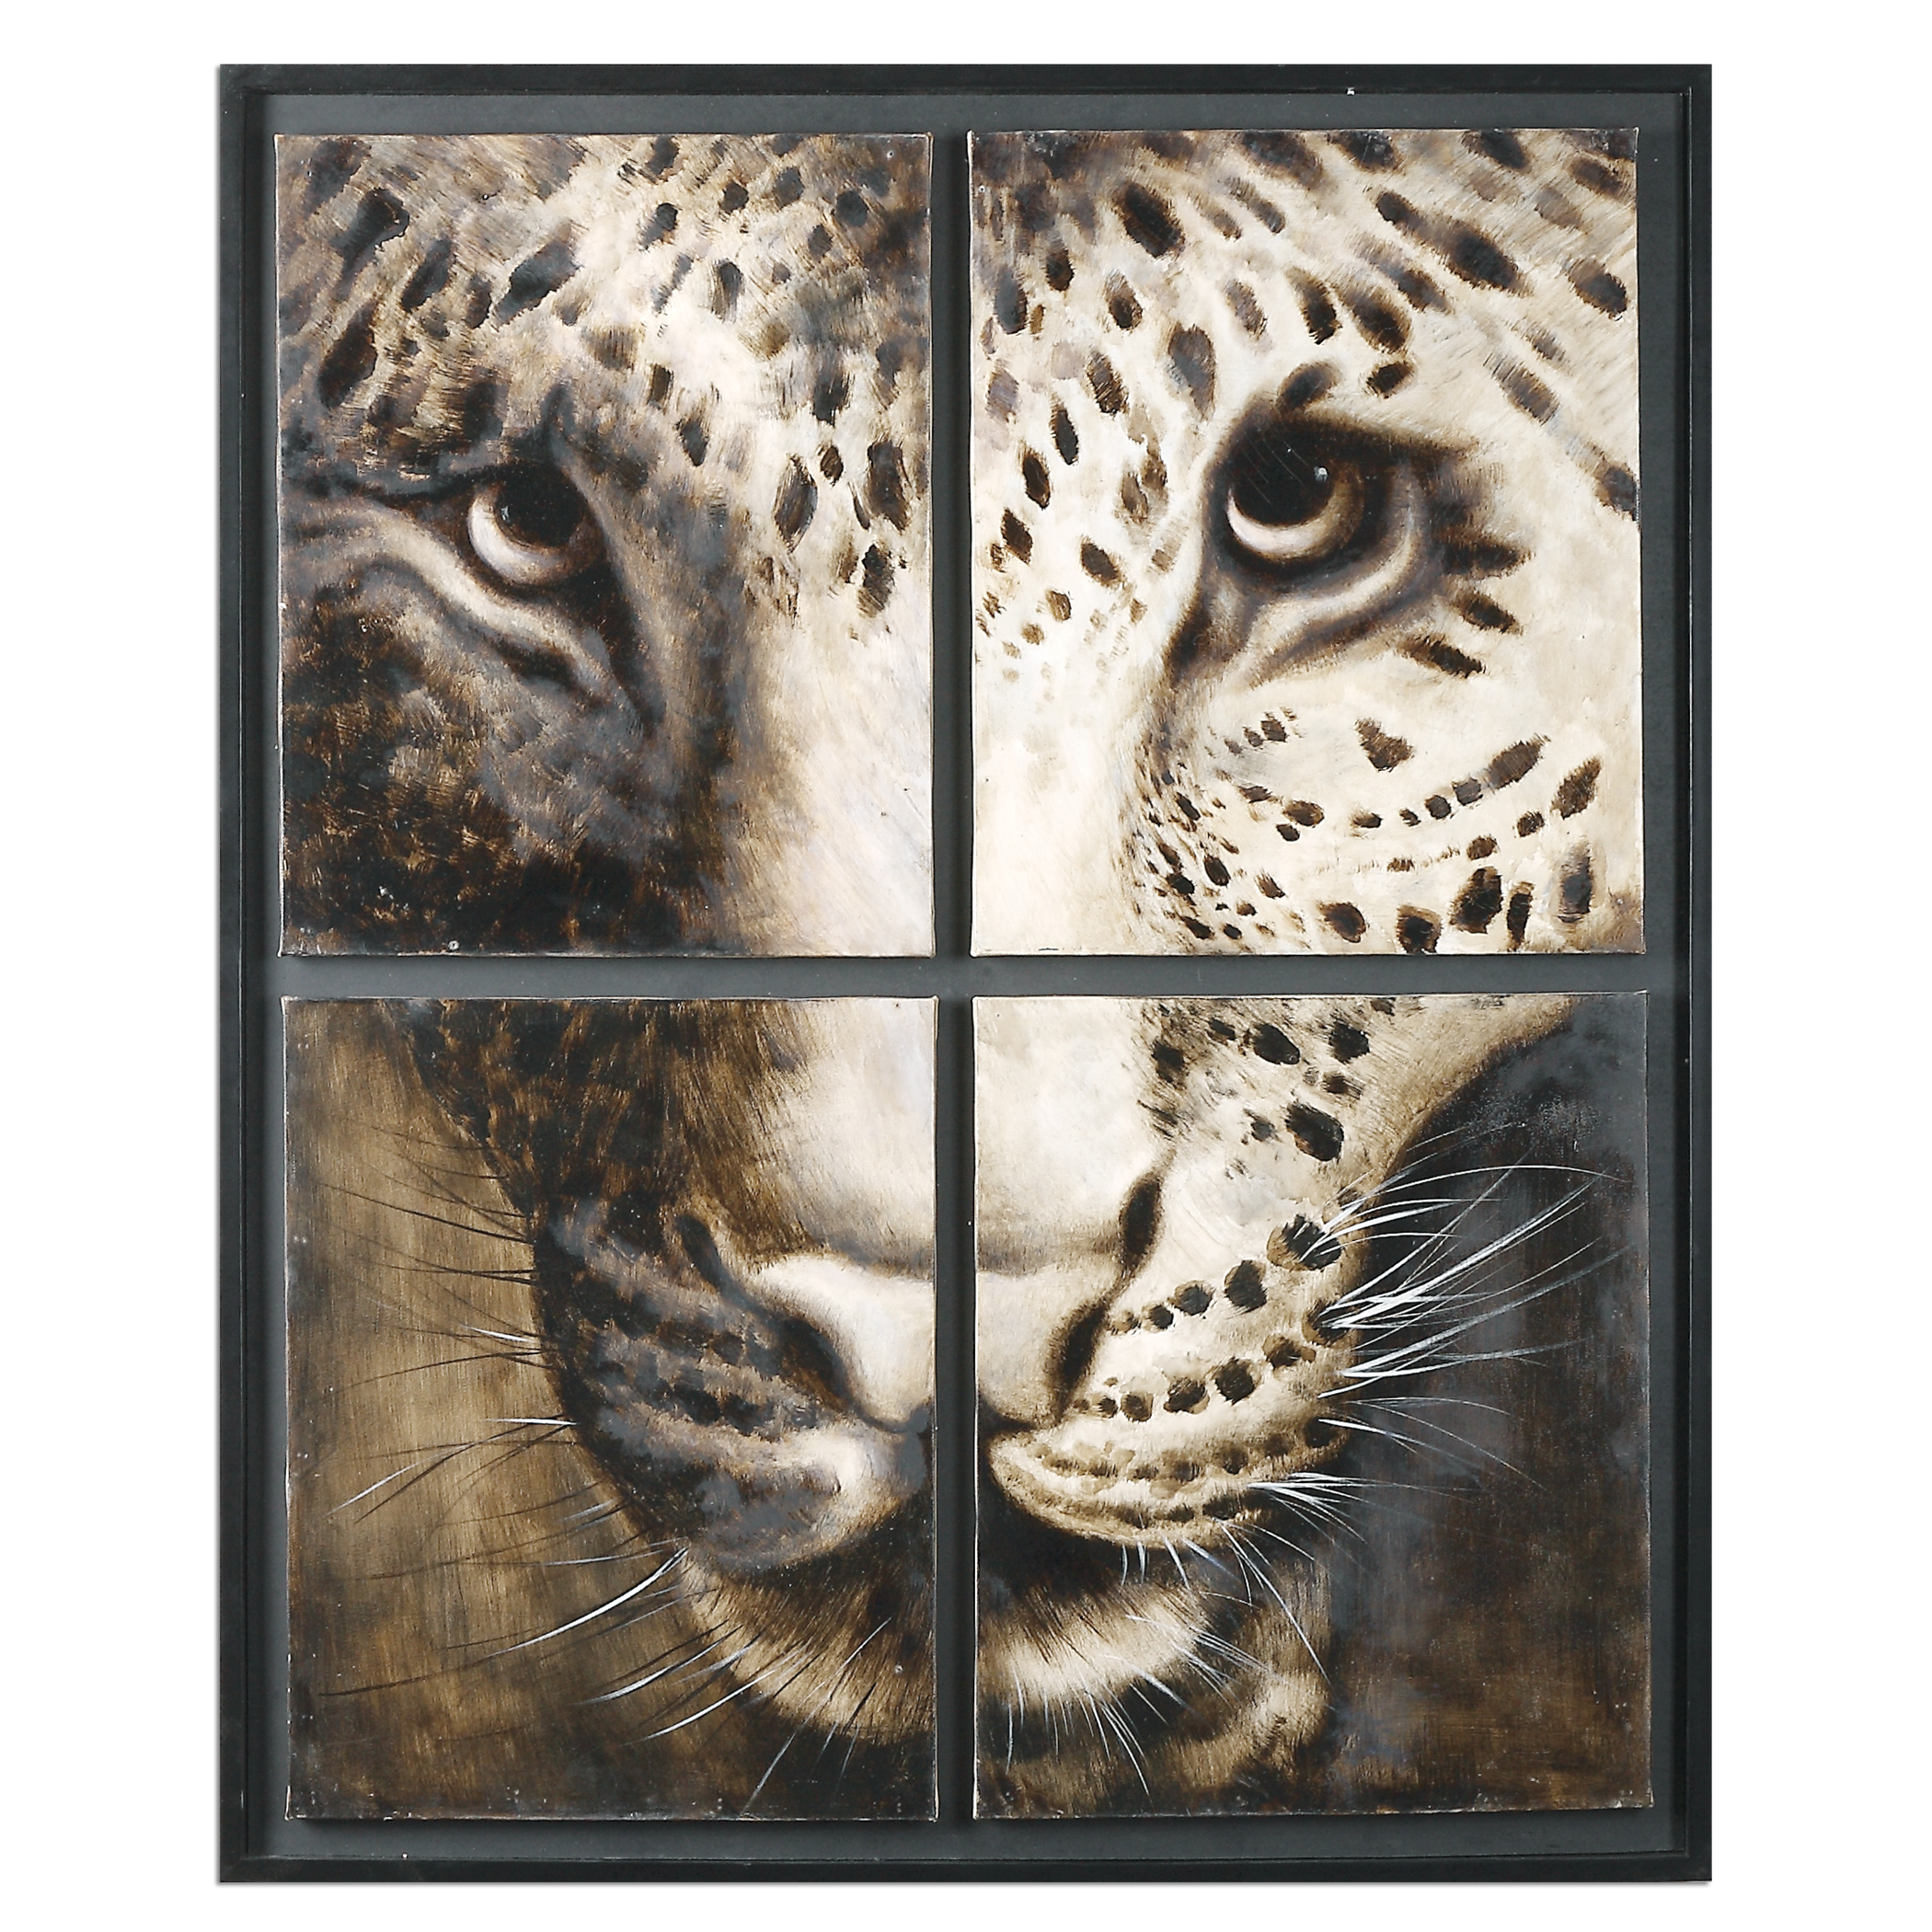 Uttermost Art On The Prowl Animal Art - Item Number: 34305